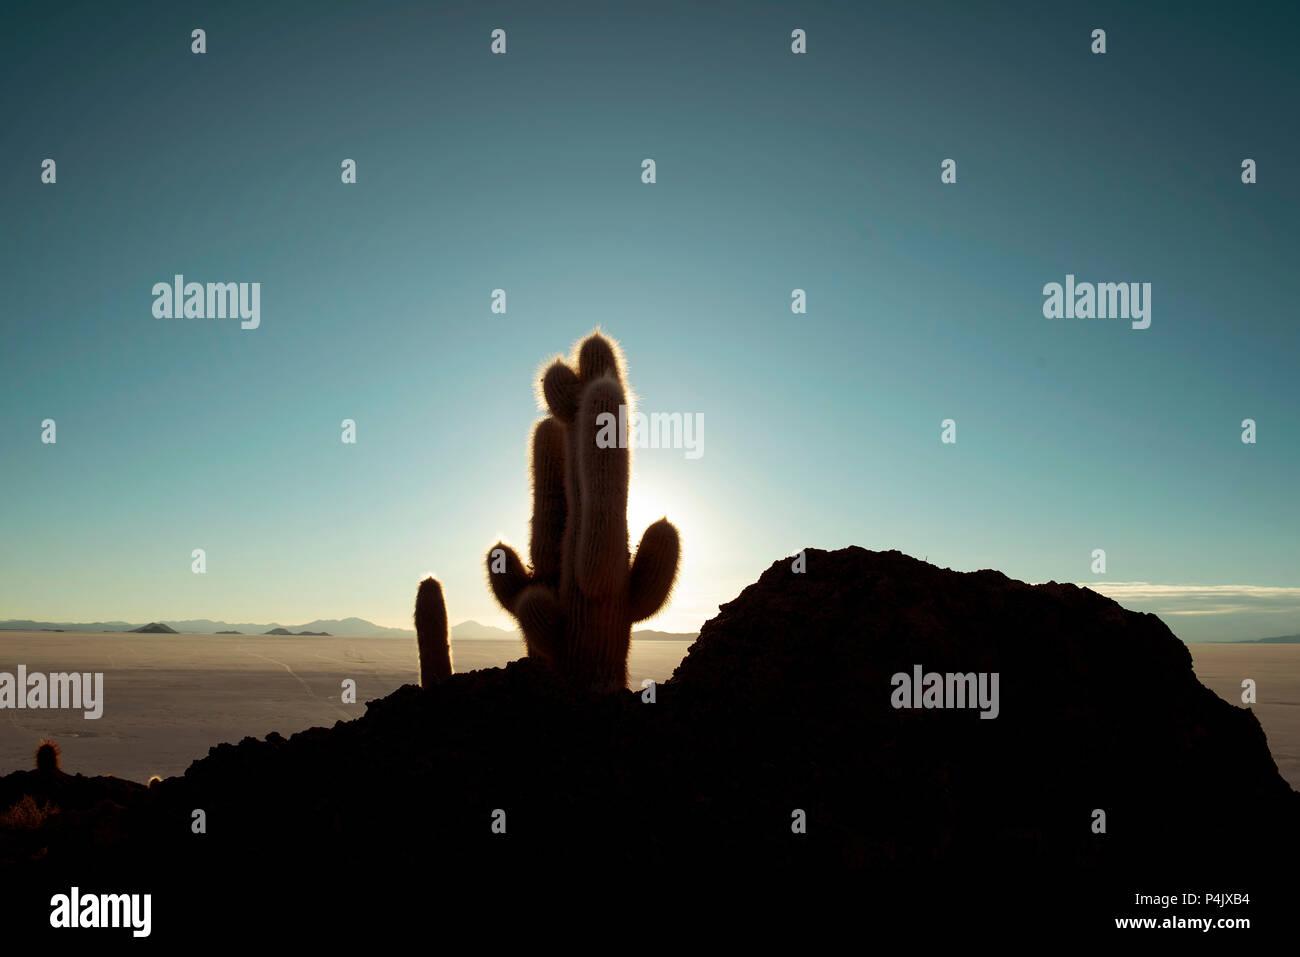 Cactus Silhouette in den Sonnenuntergang. Fisch Island (Isla del Pescado) im Salar de Uyuni, Bolivien. Stockbild